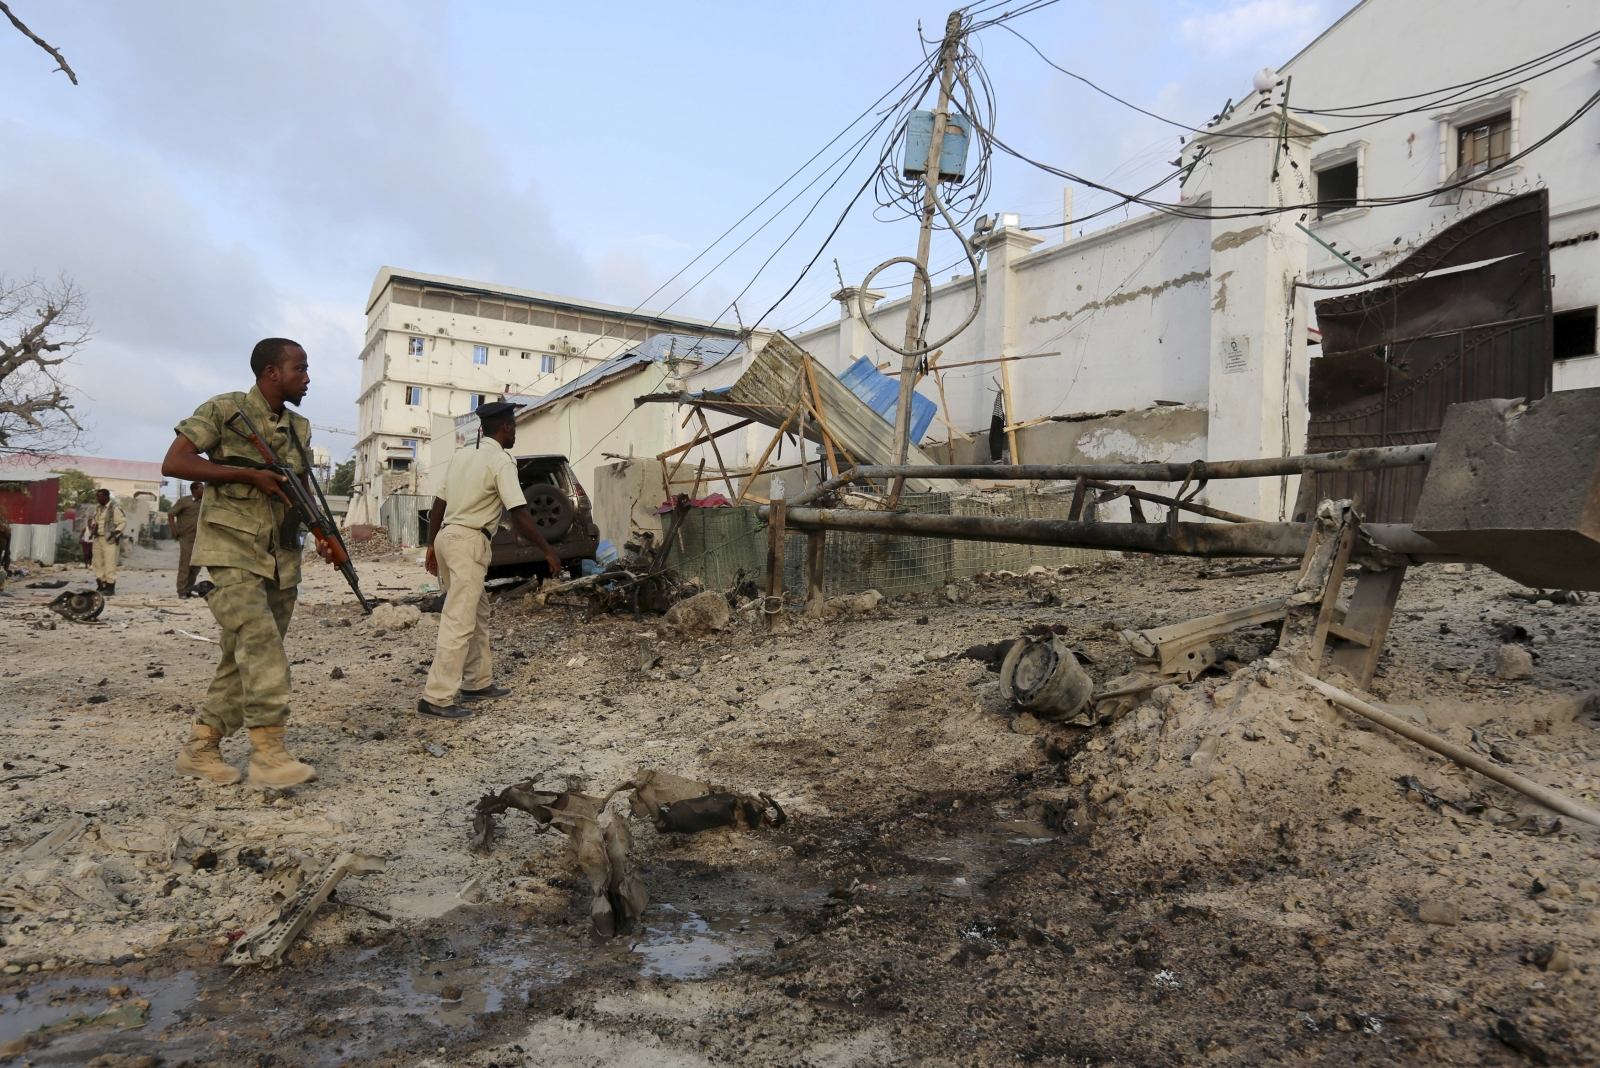 Hotel Mogadishu attack al-Shabaab